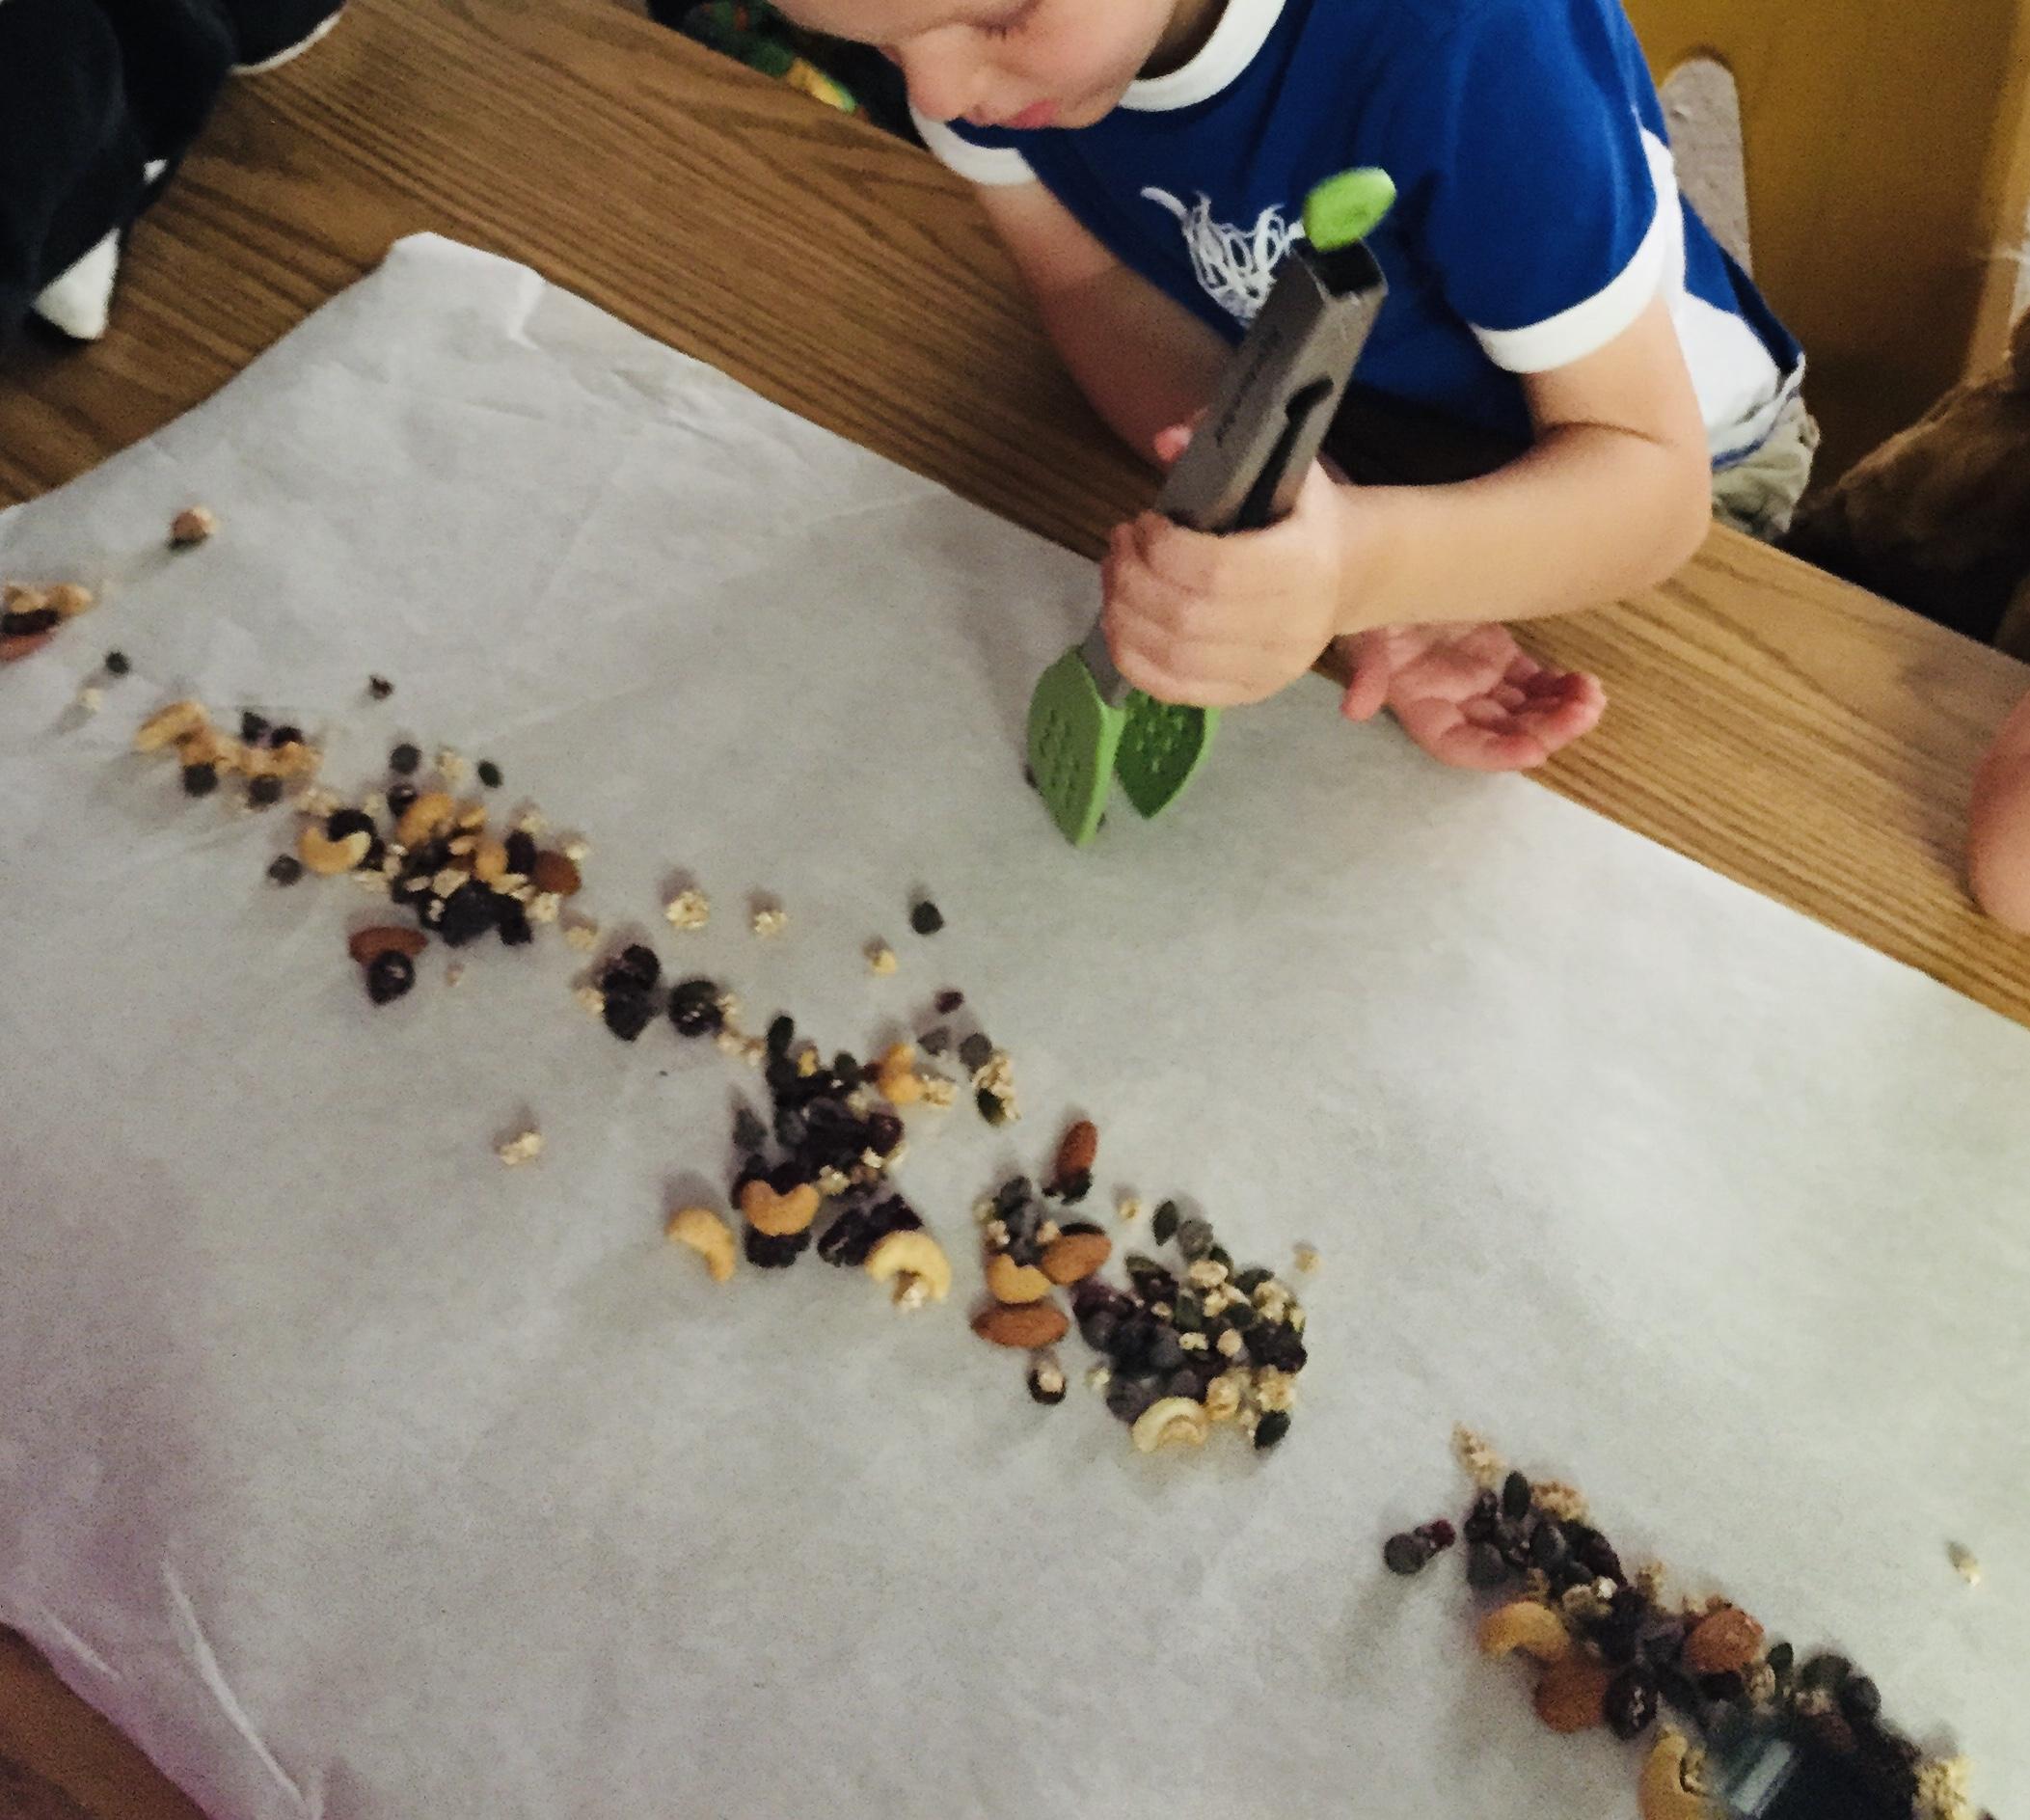 Kid using tongs to pick up various nuts